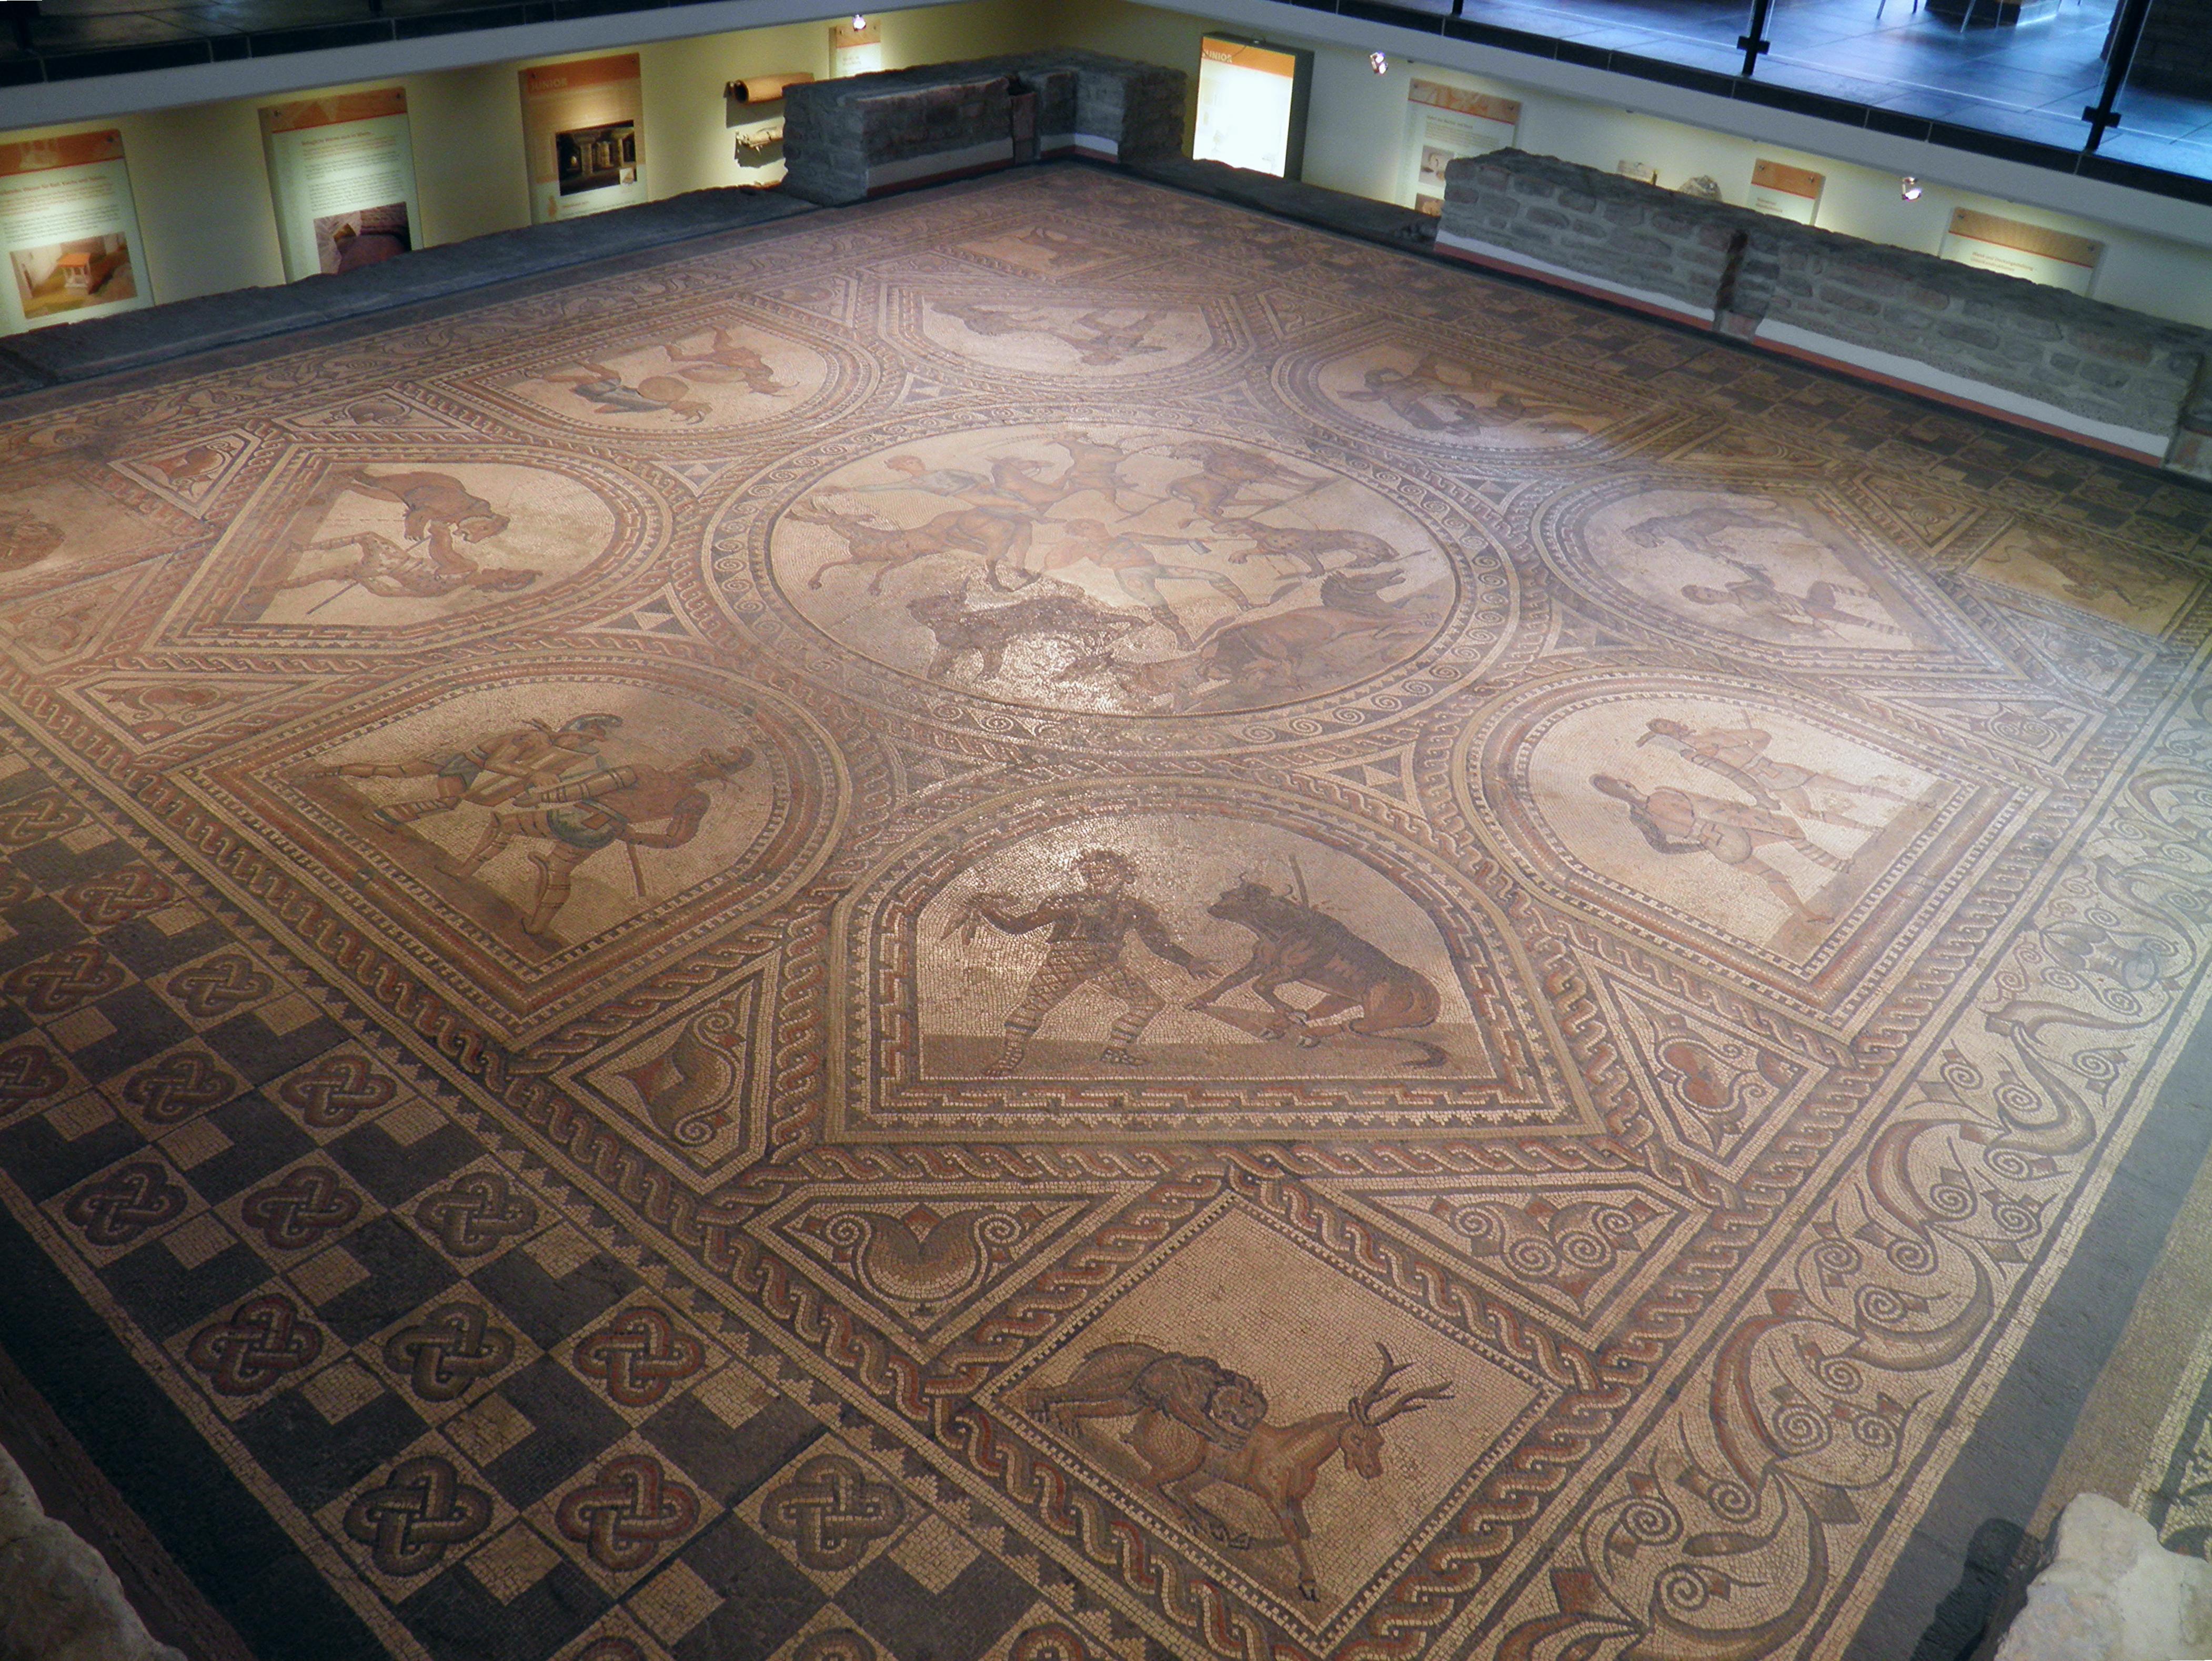 Filegladiator mosaic floor 3rd century ad rmerhalle bad filegladiator mosaic floor 3rd century ad rmerhalle bad kreuznach germany dailygadgetfo Gallery